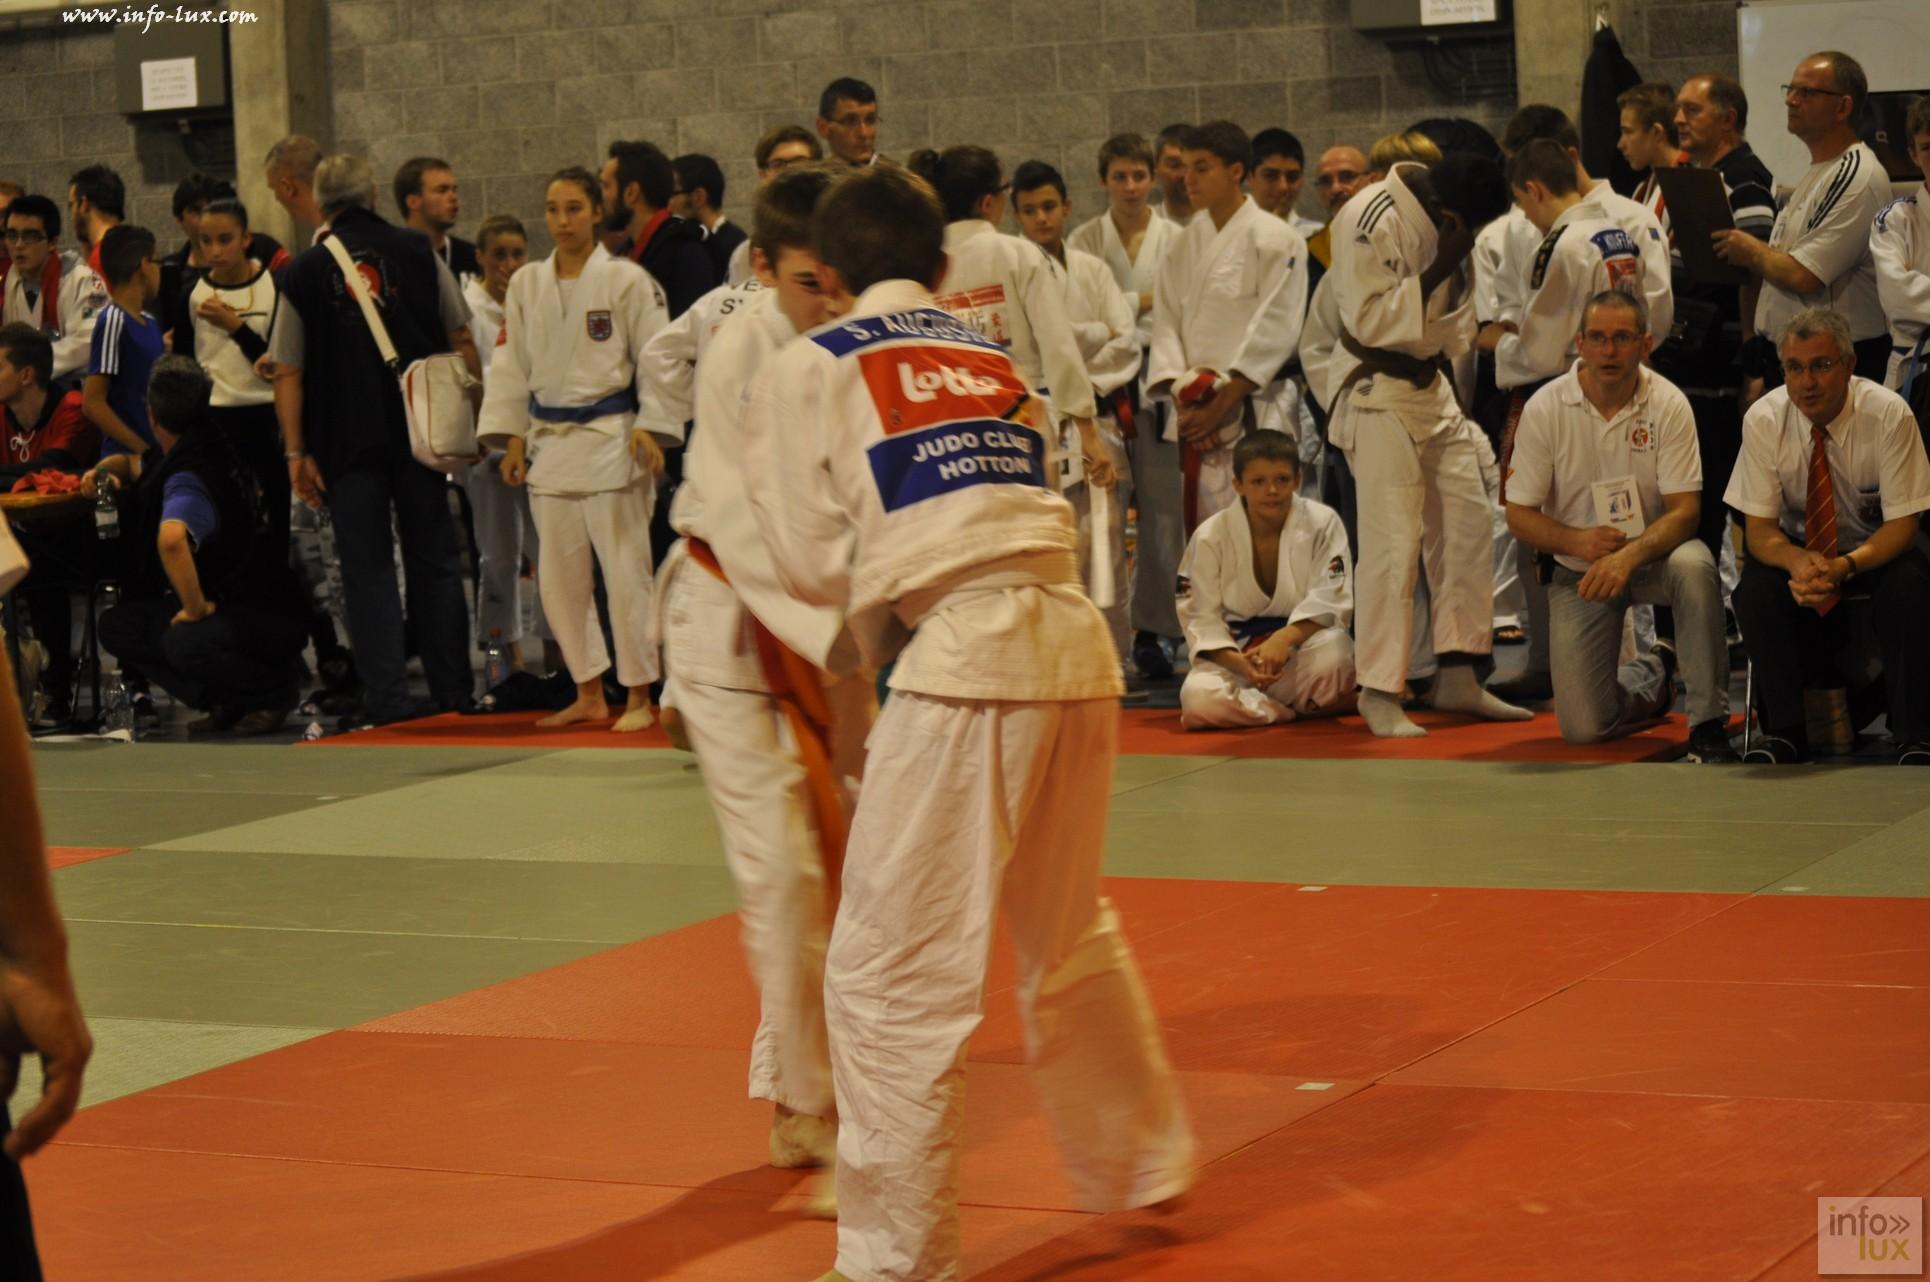 images/stories/PHOTOSREP/Bastogne/judo/Judo-Basto155